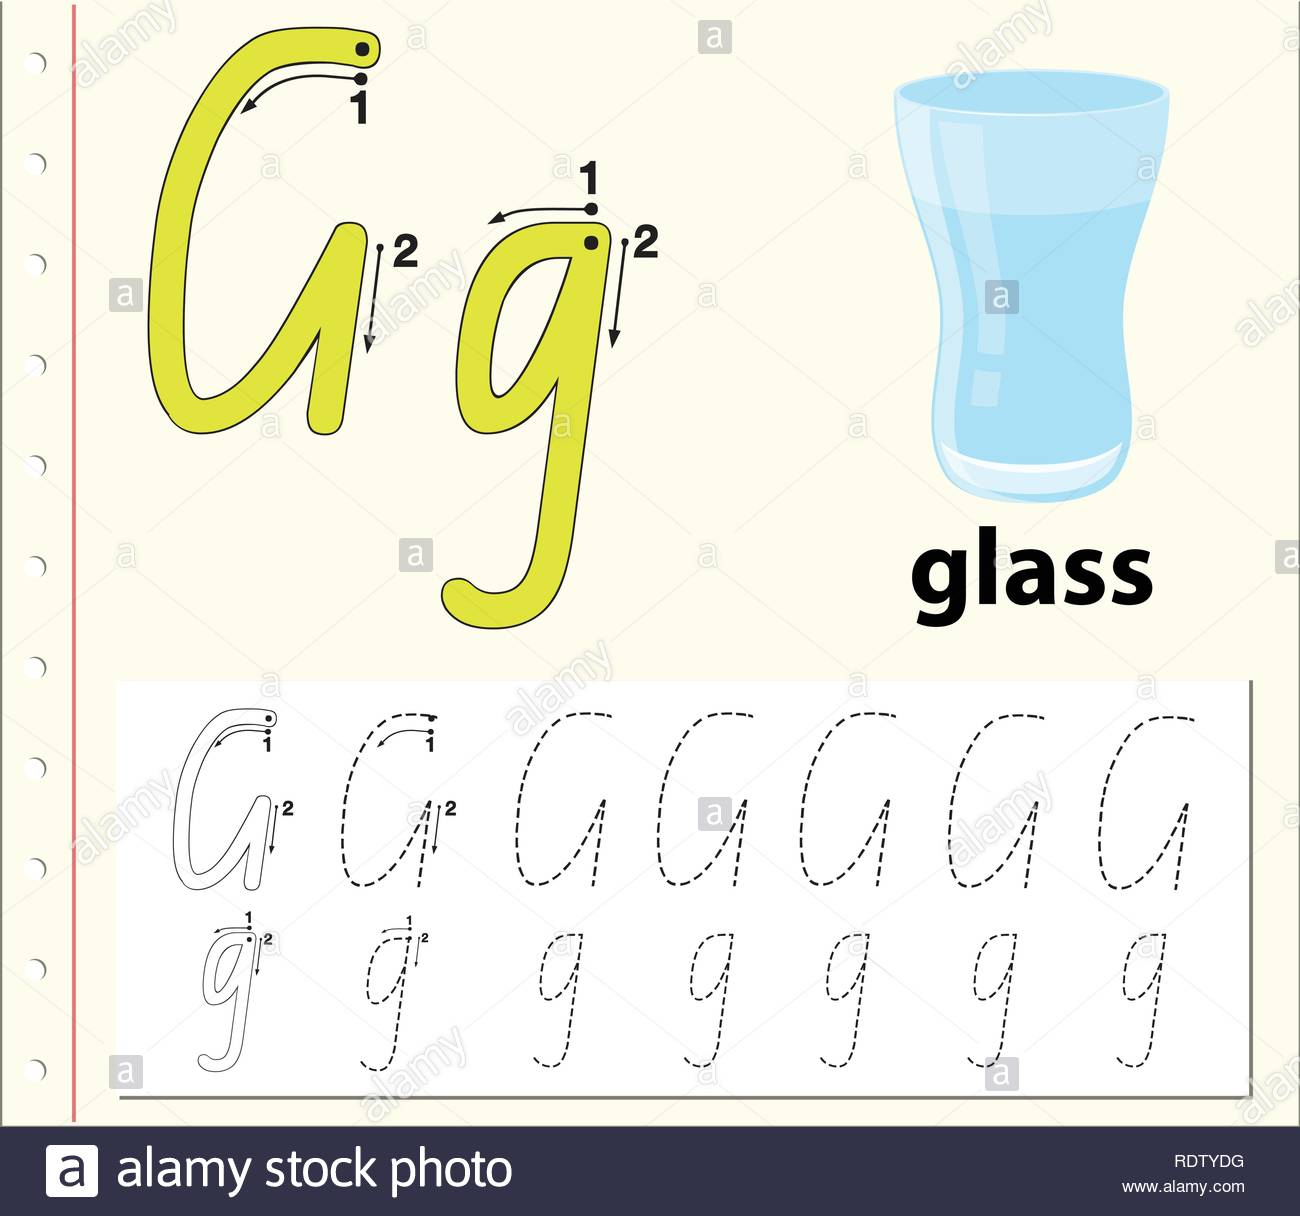 Letter G Tracing Alphabet Worksheets Illustration Stock inside Tracing Letters Software